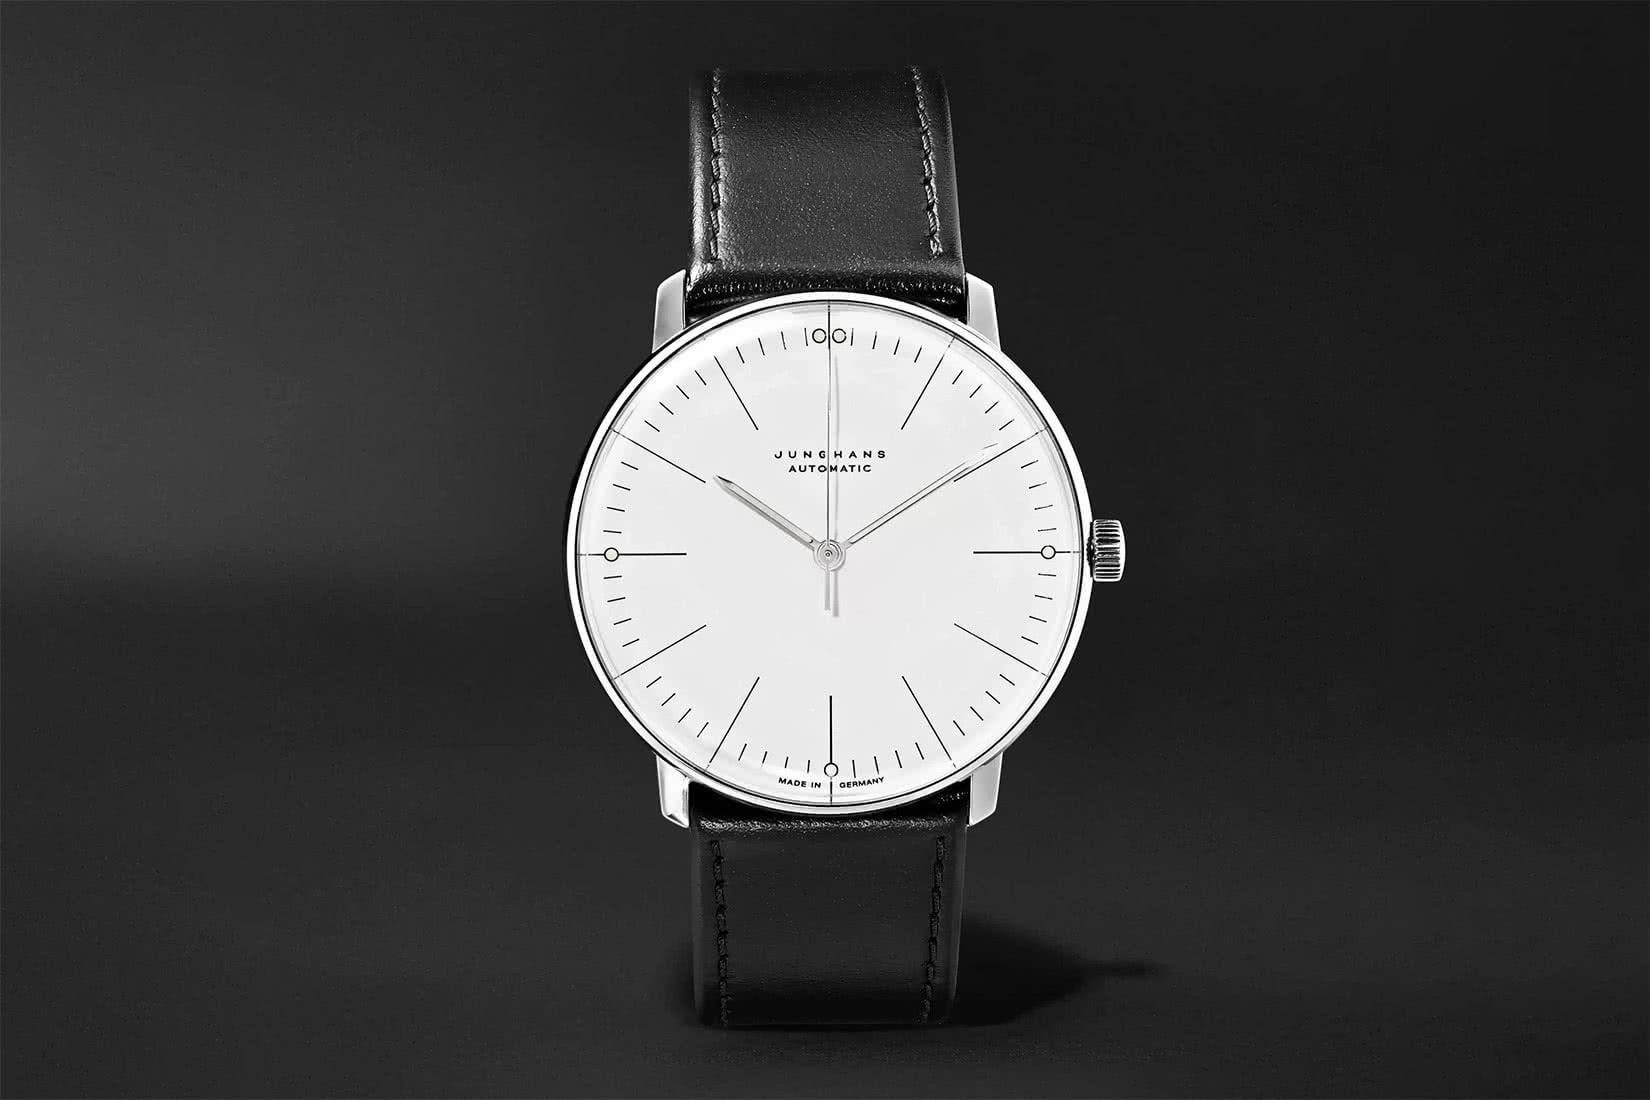 watch price range premium reasonable - Luxe Digital